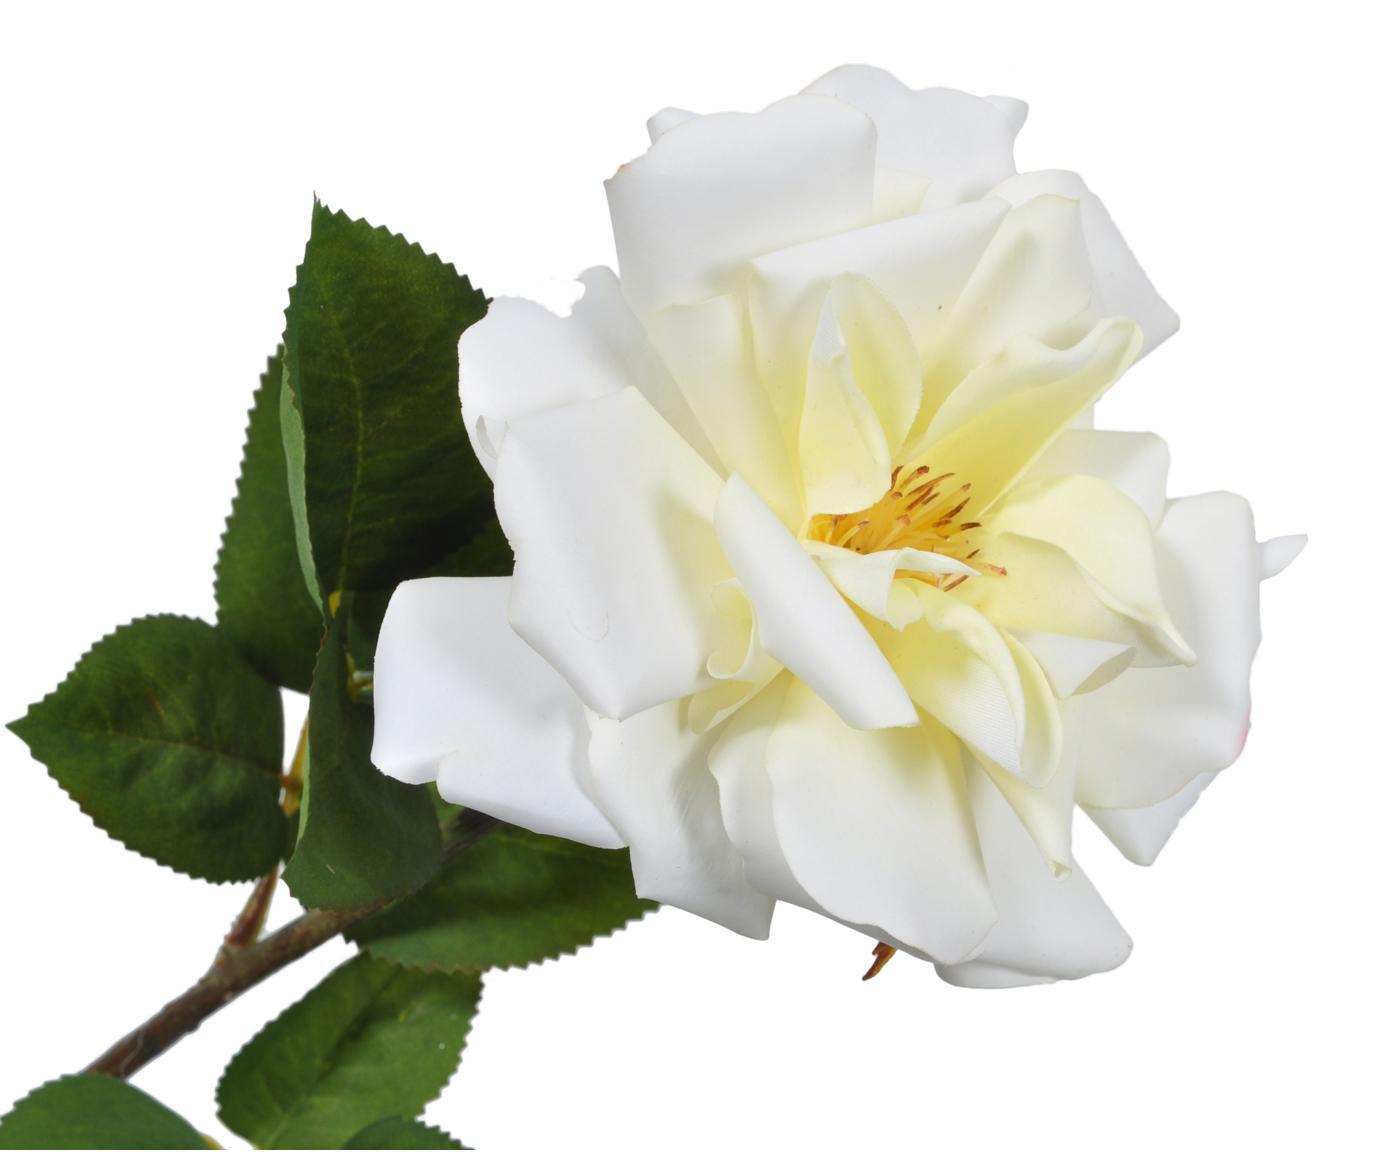 Kunstbloem Rose Alina, Bloem: kunststof, Steel: metaal, Wit, geel, L 54 cm